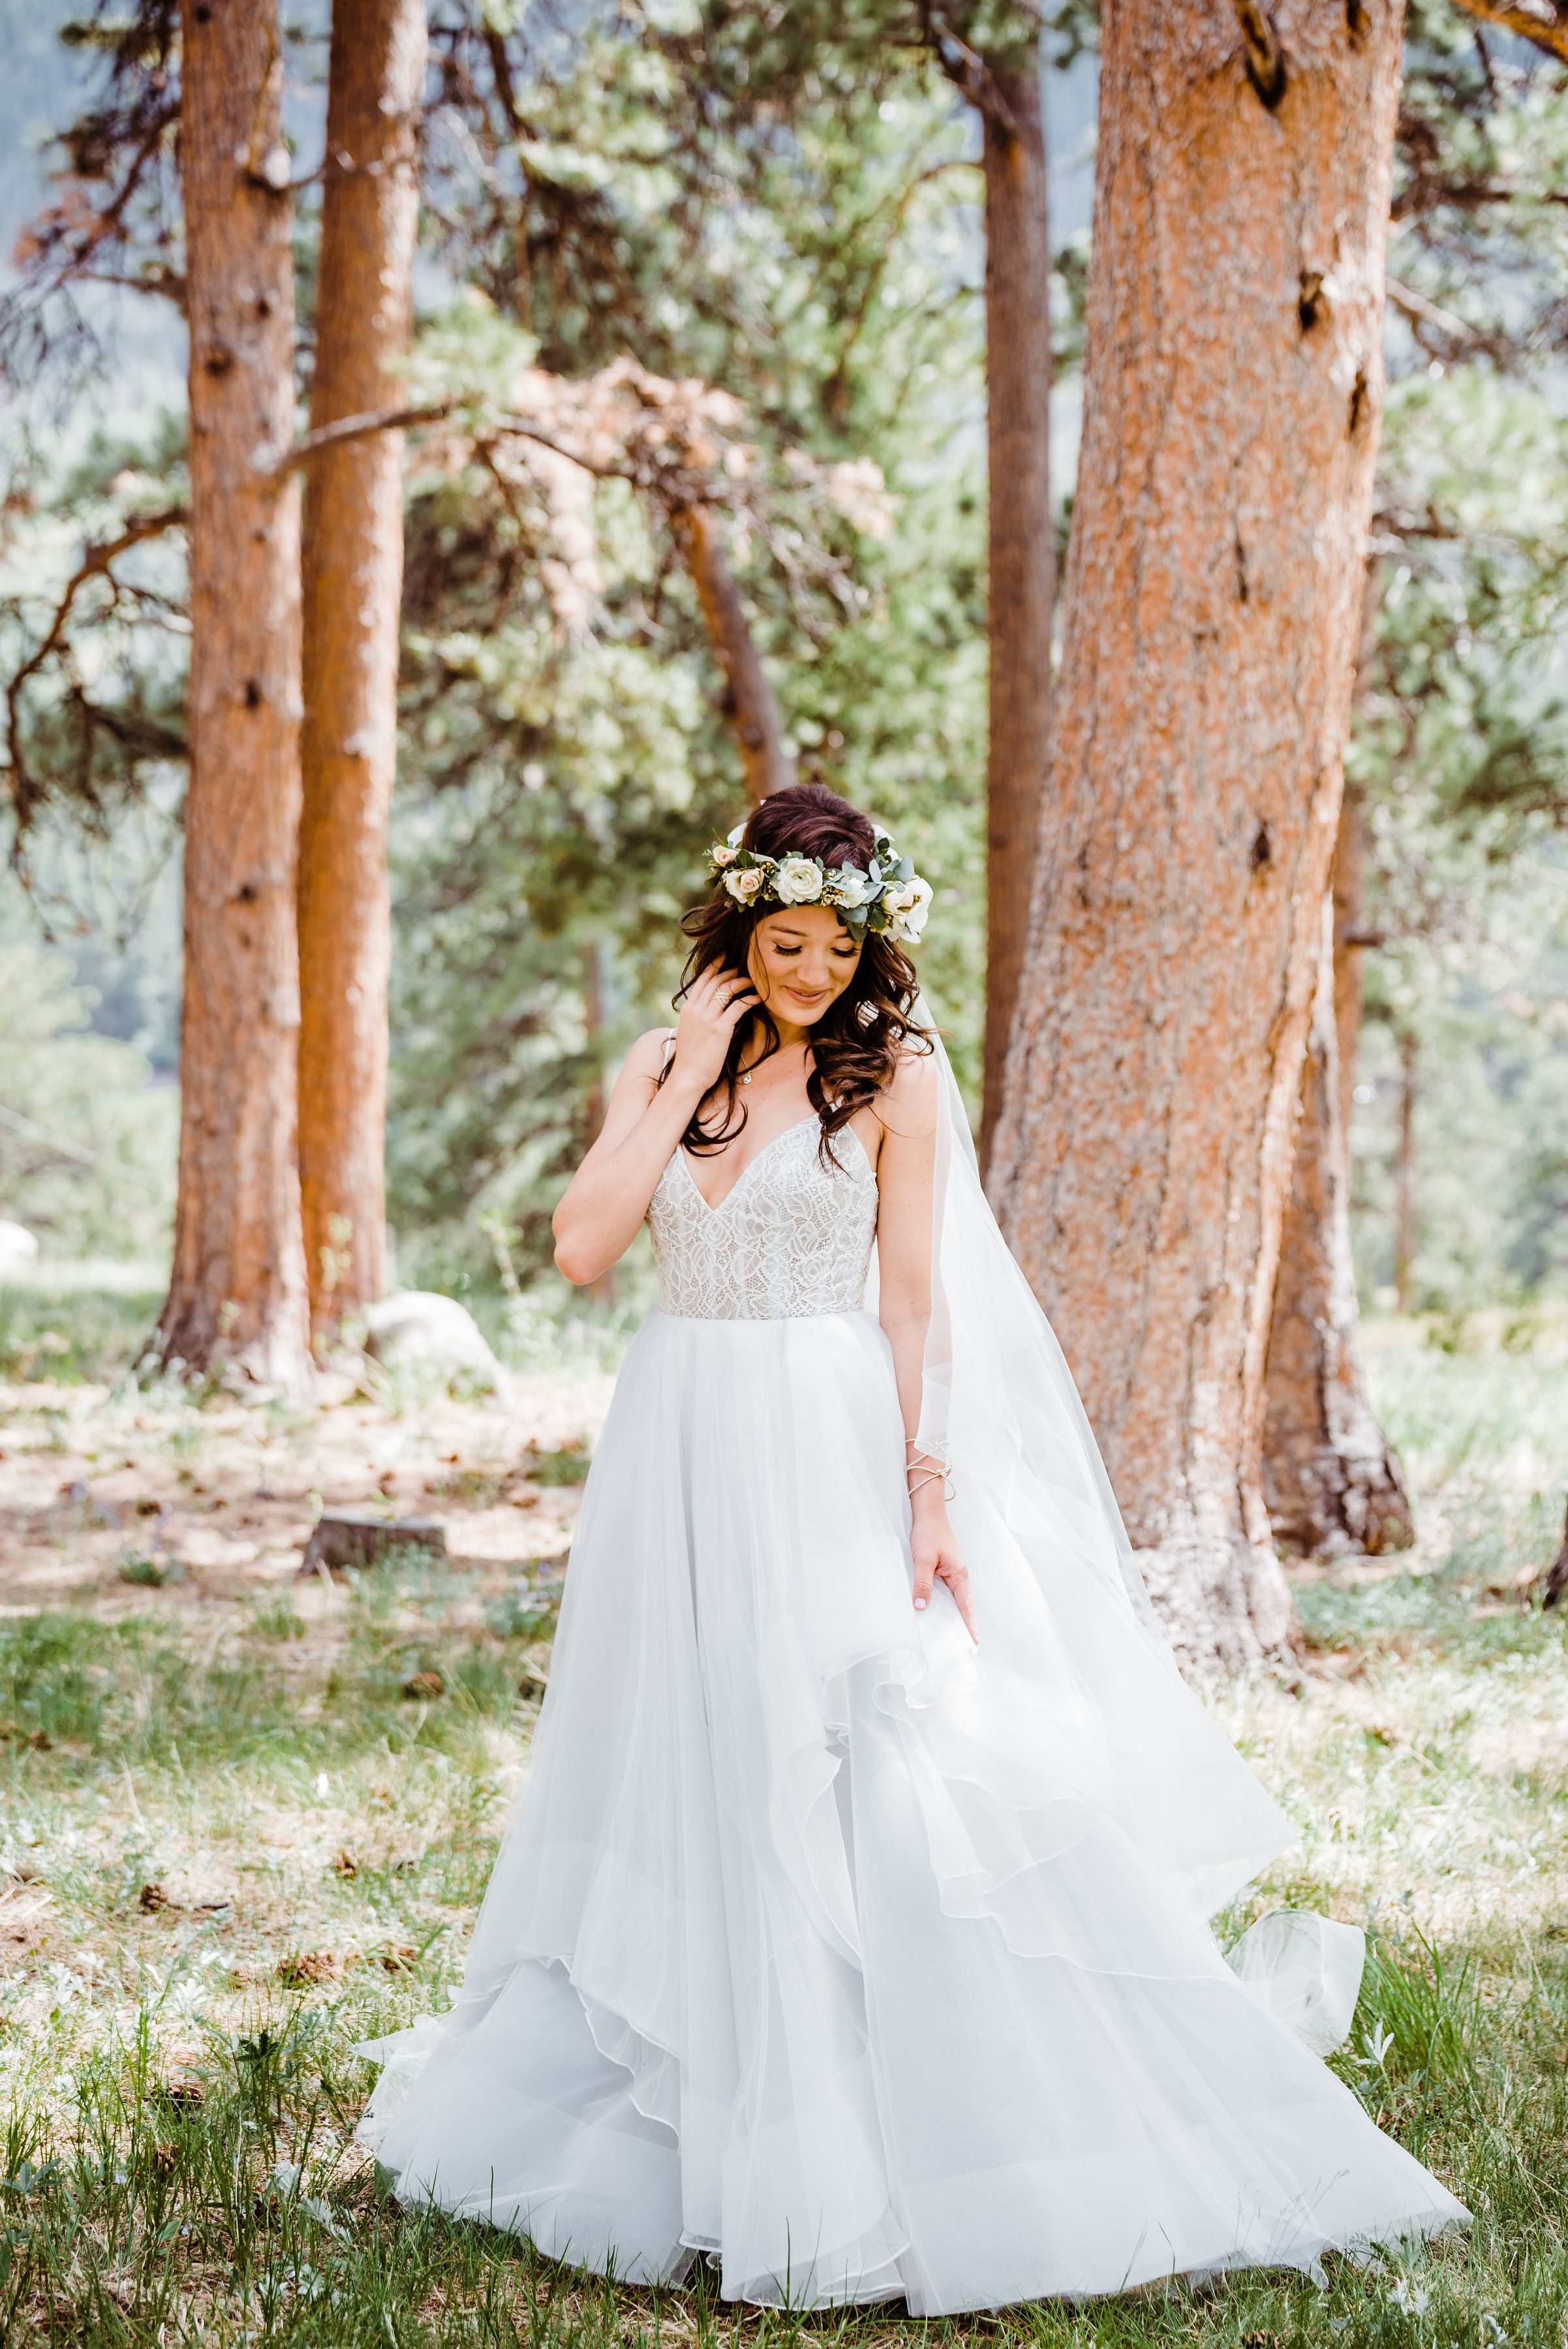 Pin by Minted on Mountain Wedding | Pinterest | Elegant wedding ...